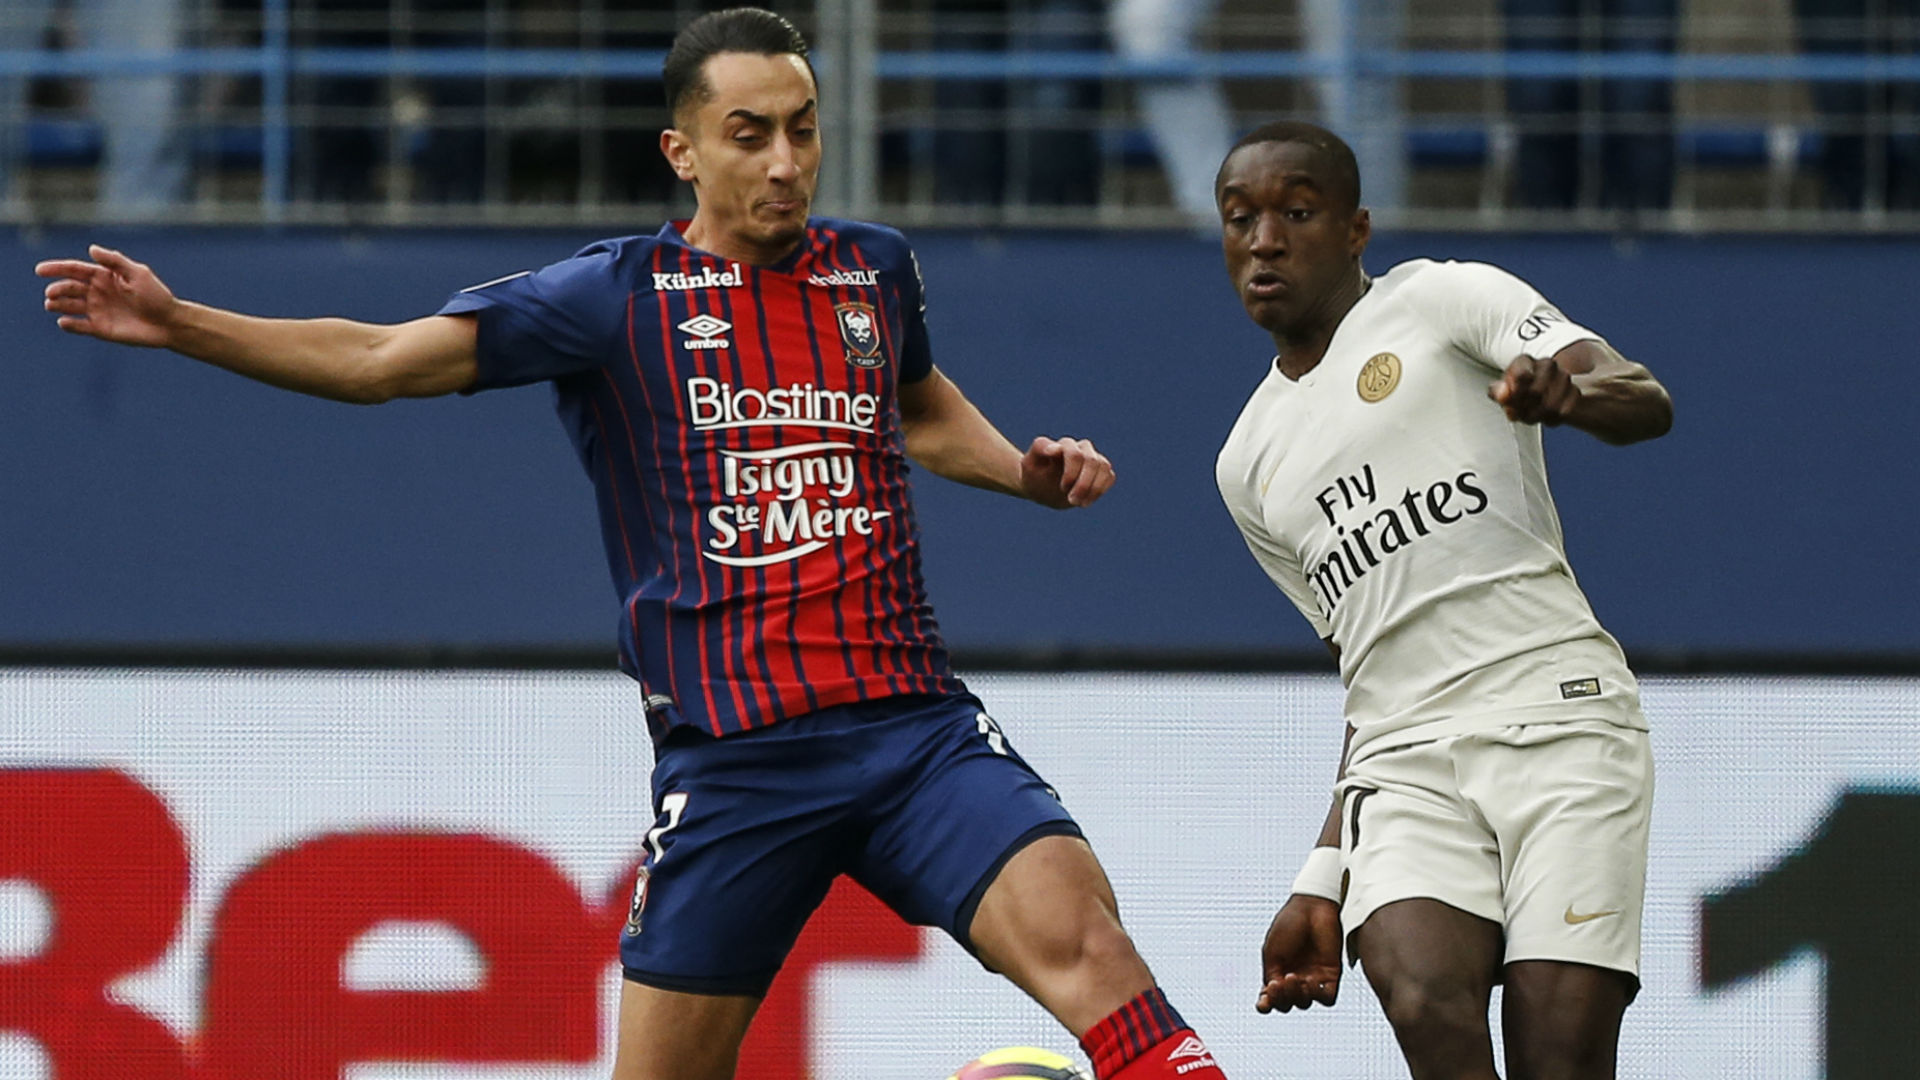 Paris Saint-Germain, Buffon esalta il suo ruolo da leader: